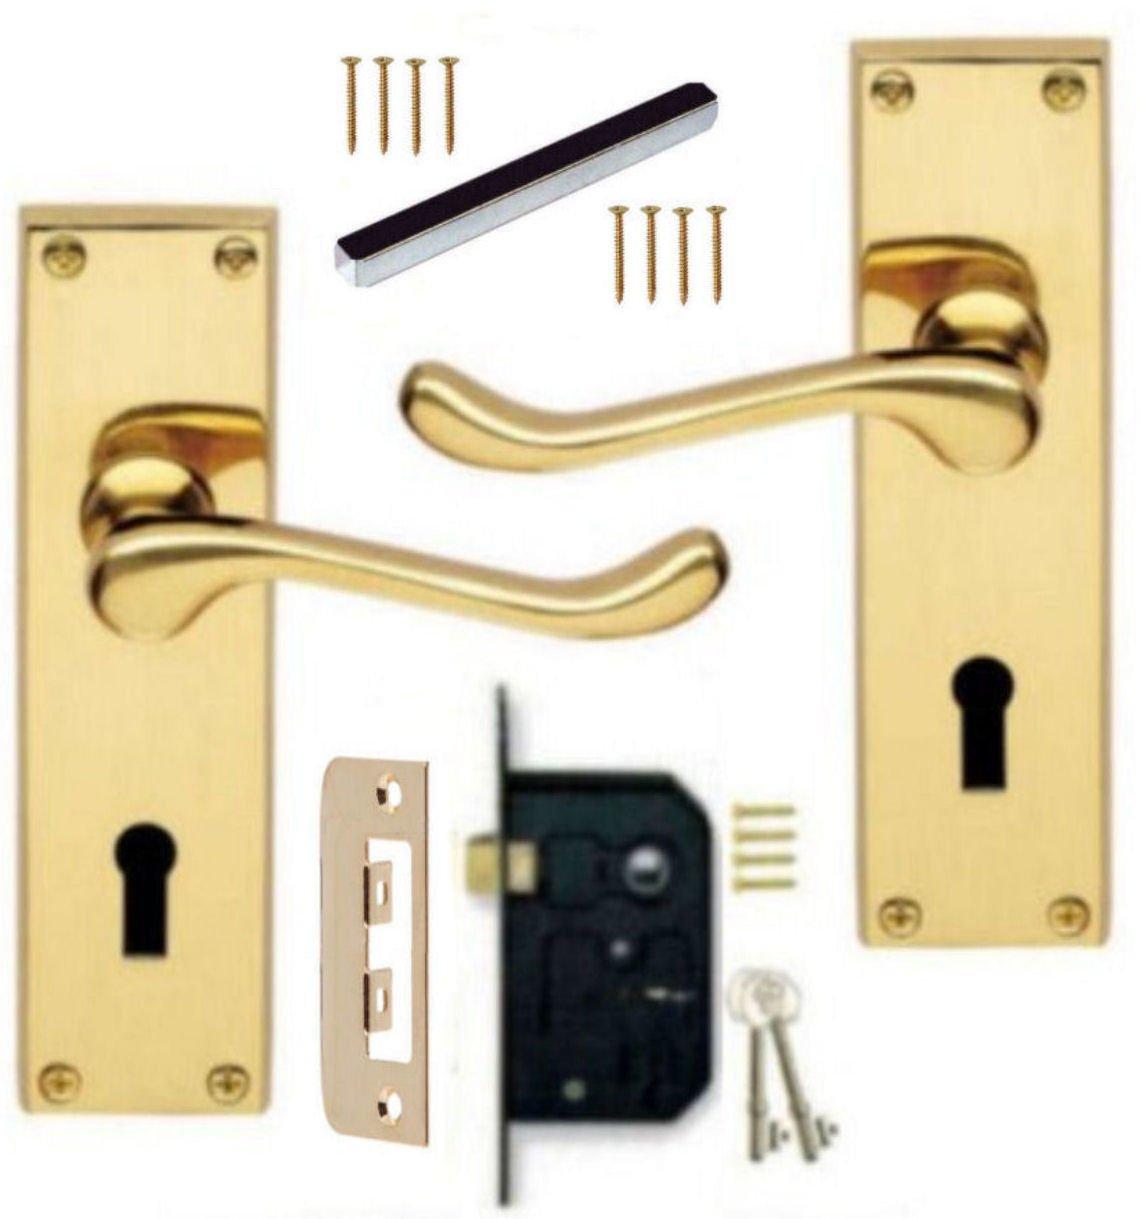 Polished Brass Victorian Lever Lock Door Handles Keyed 64mm 3 Lever Lock SET KA